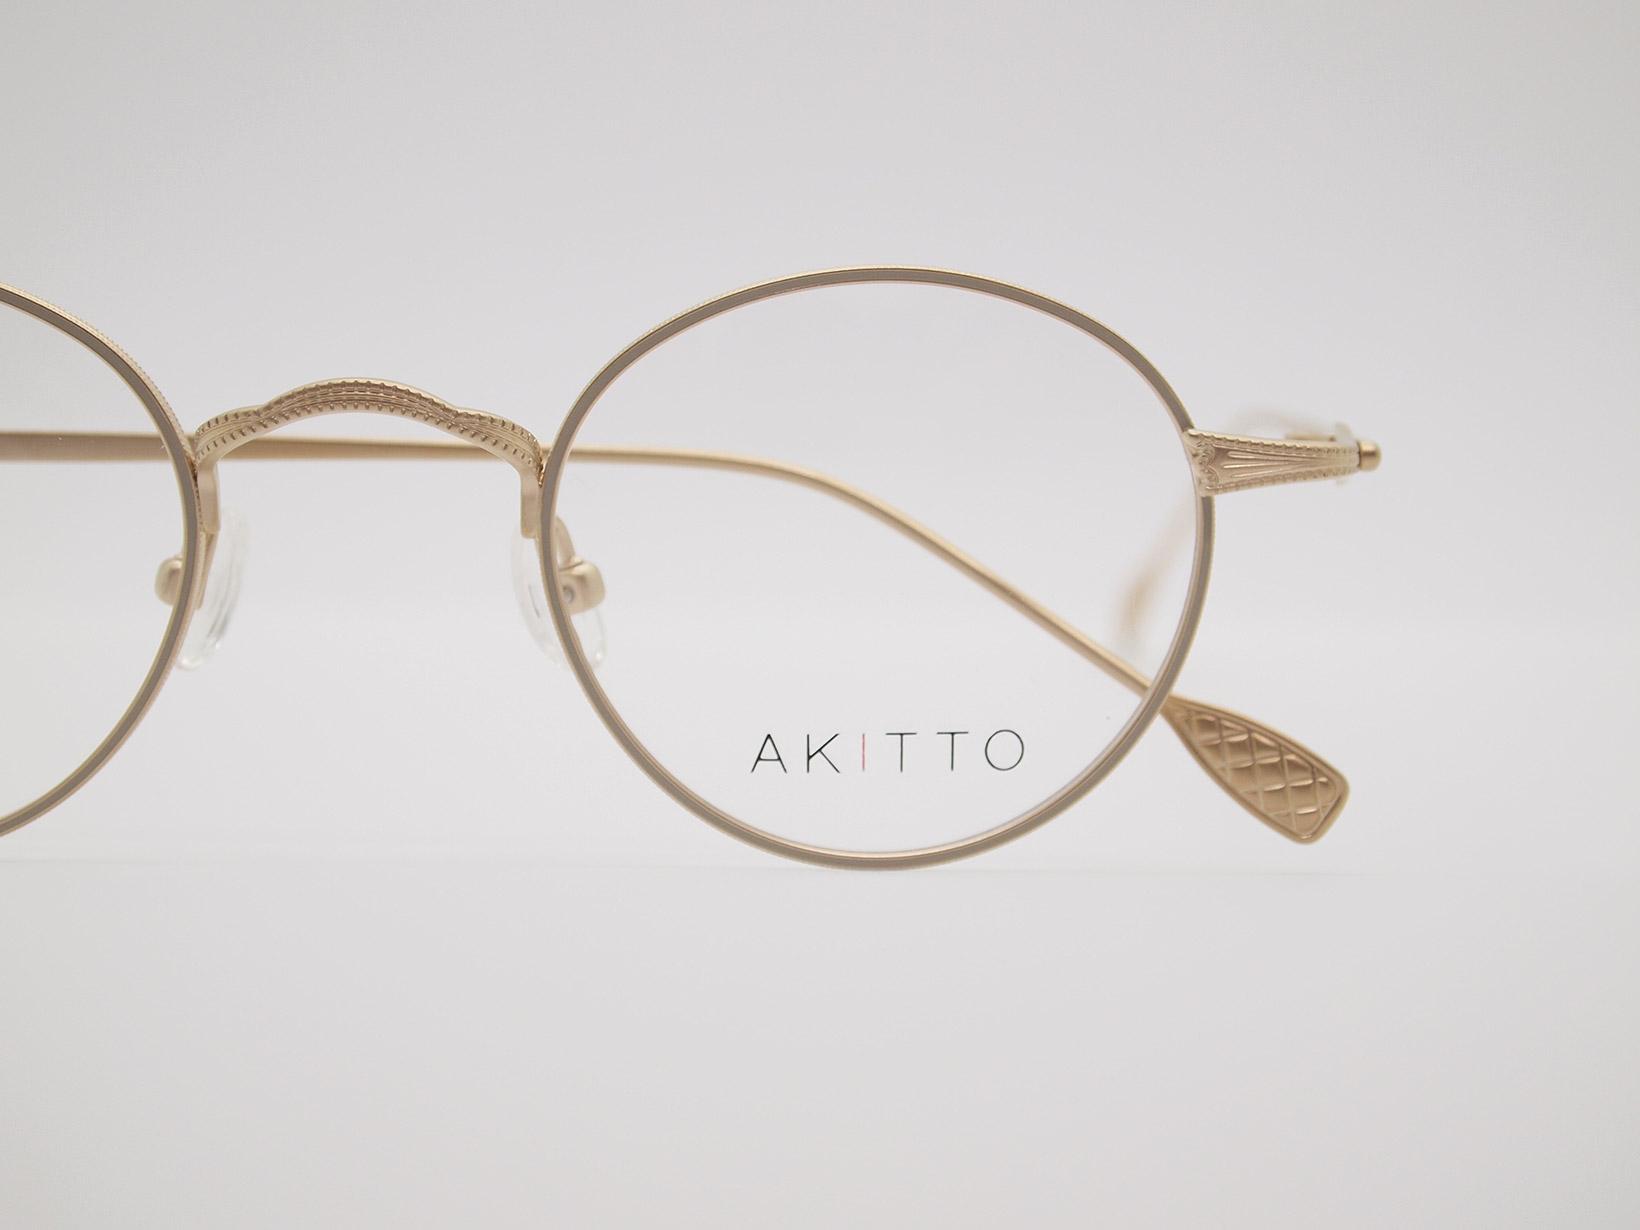 AKITTO 2021-4th tas1 size:43□23 material:titanium price:¥46,200-(税込み)